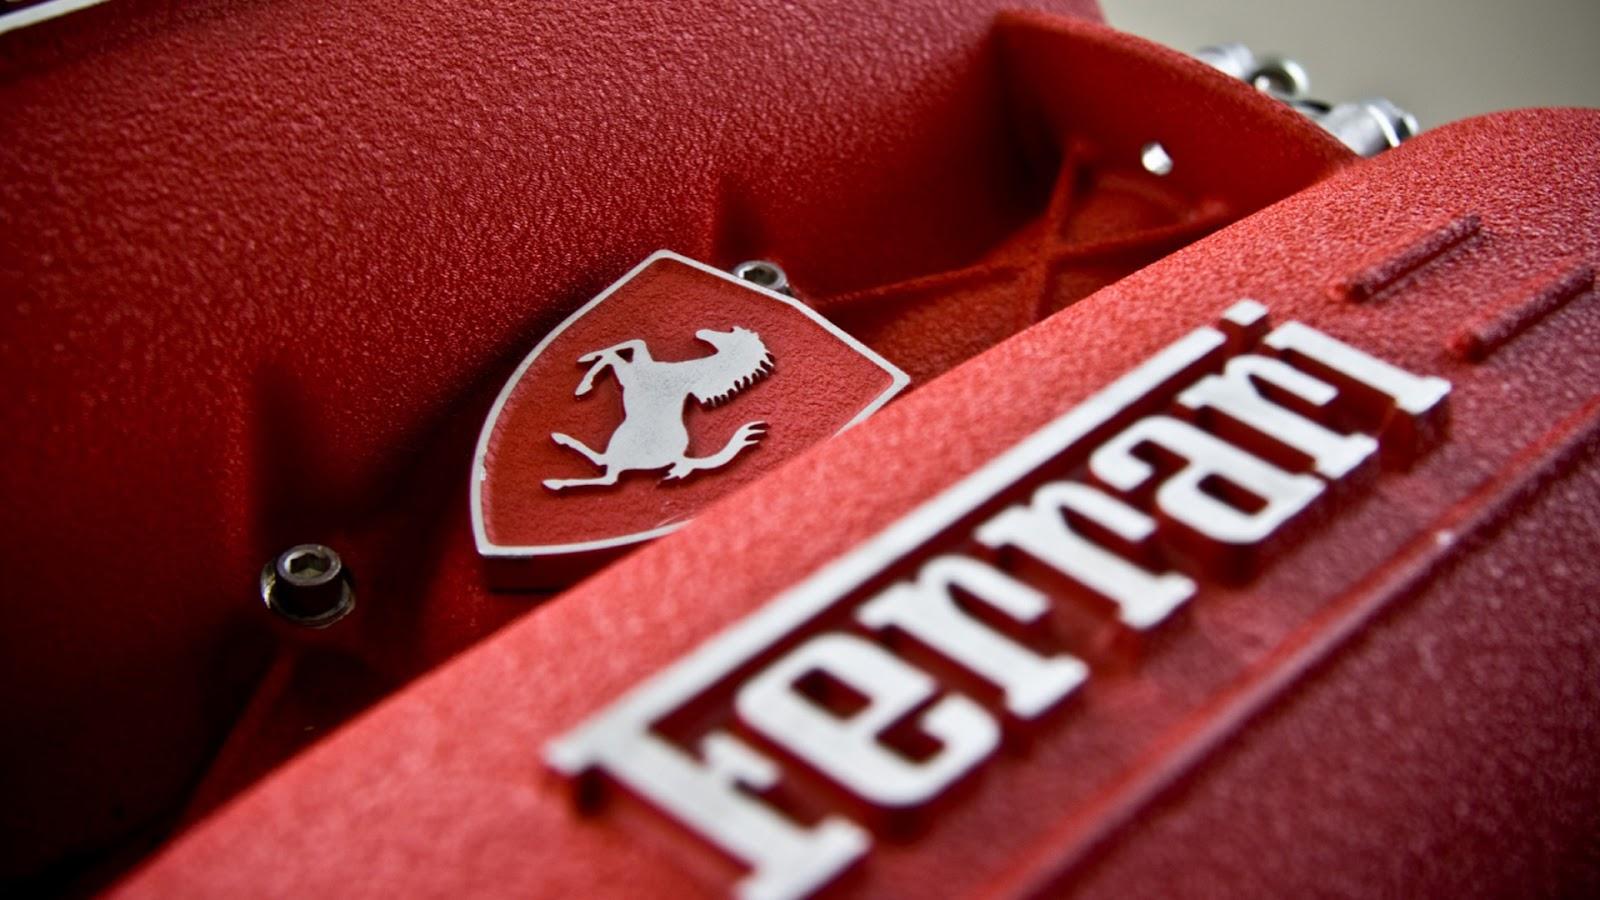 Ferrari Logo Wallpaper Hd For Iphone